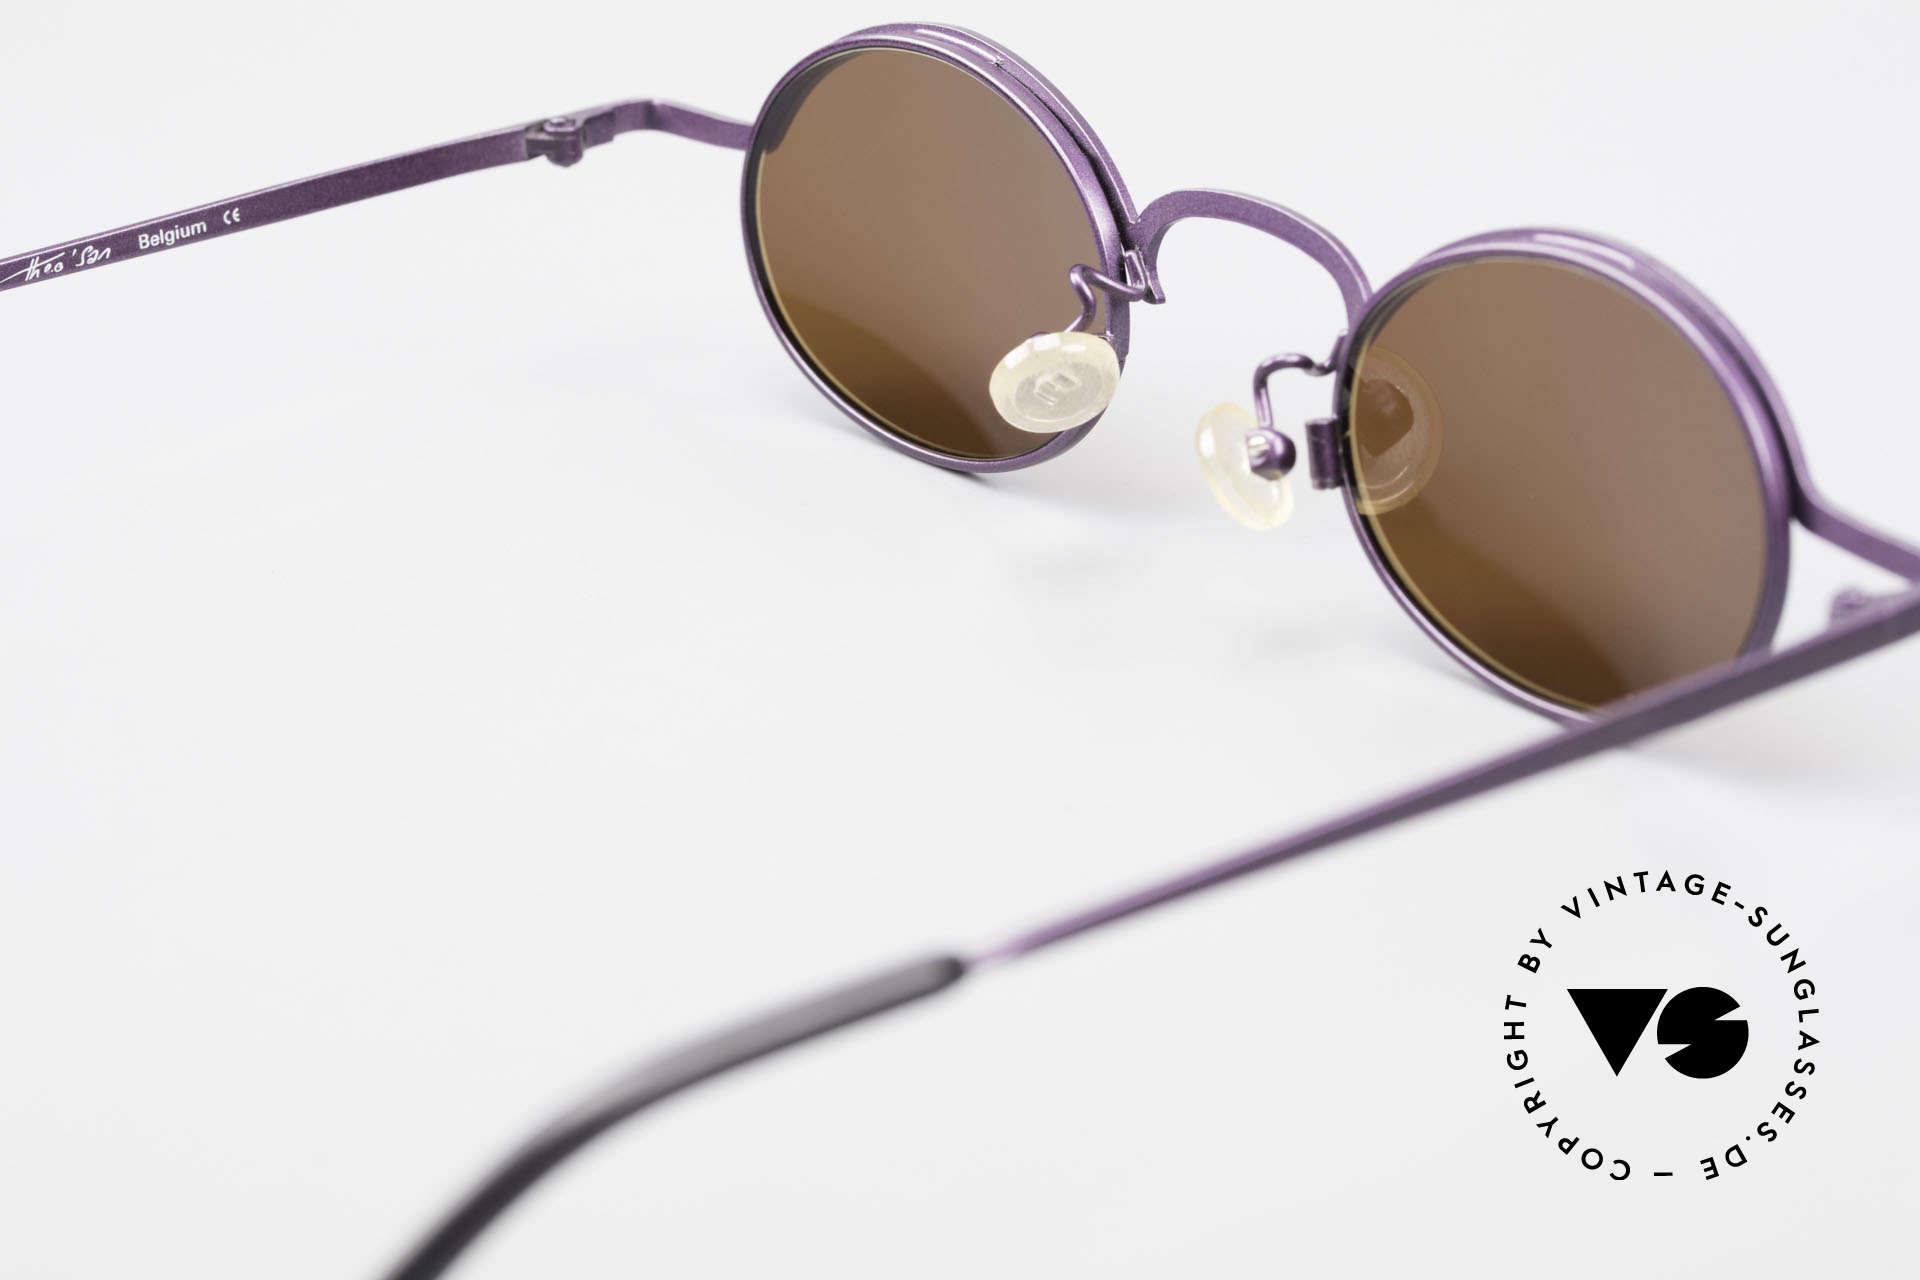 Theo Belgium San 90's Oval Designer Sunglasses, so to speak: vintage sunglasses with representativeness, Made for Women